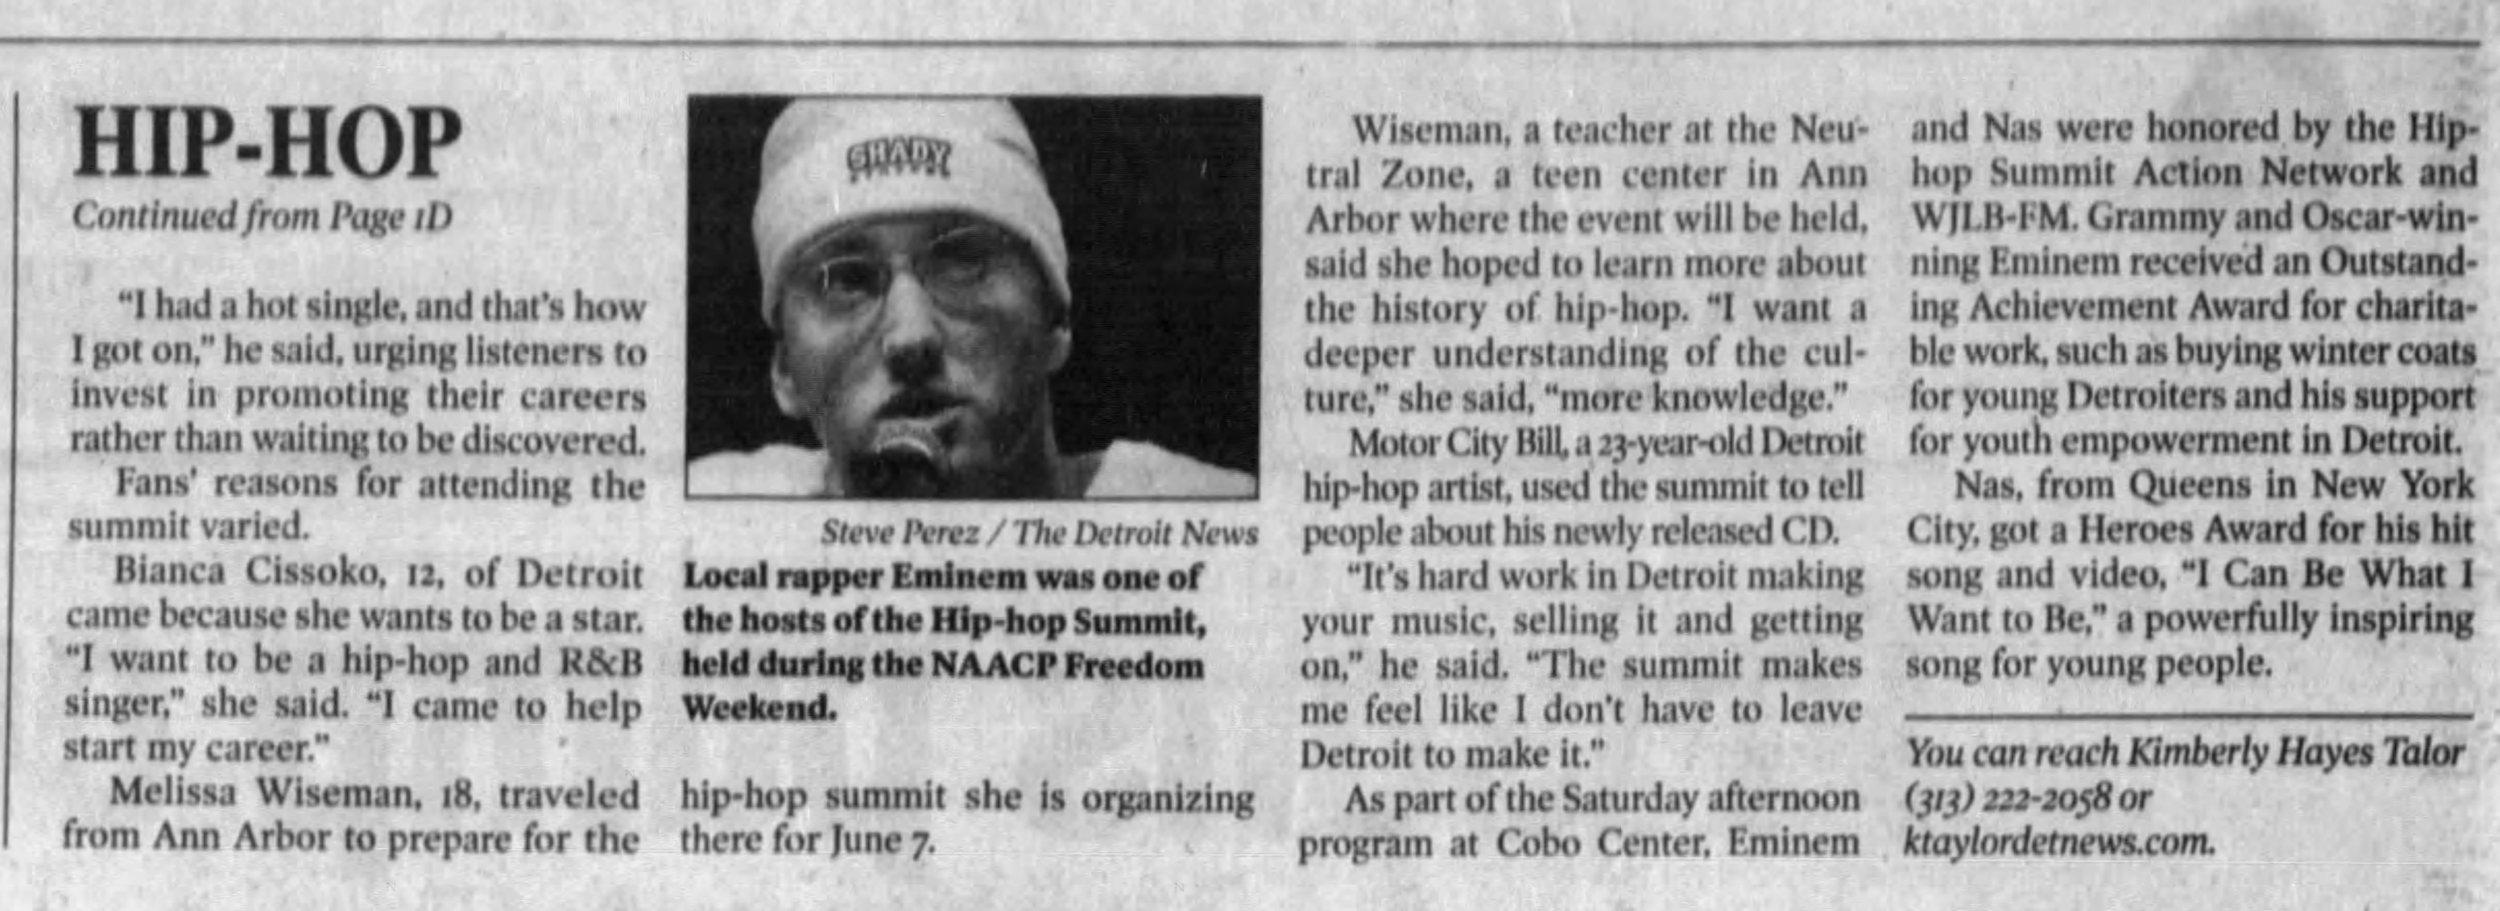 Detroit_Free_Press_Sun__Apr_27__2003_ (3).jpg